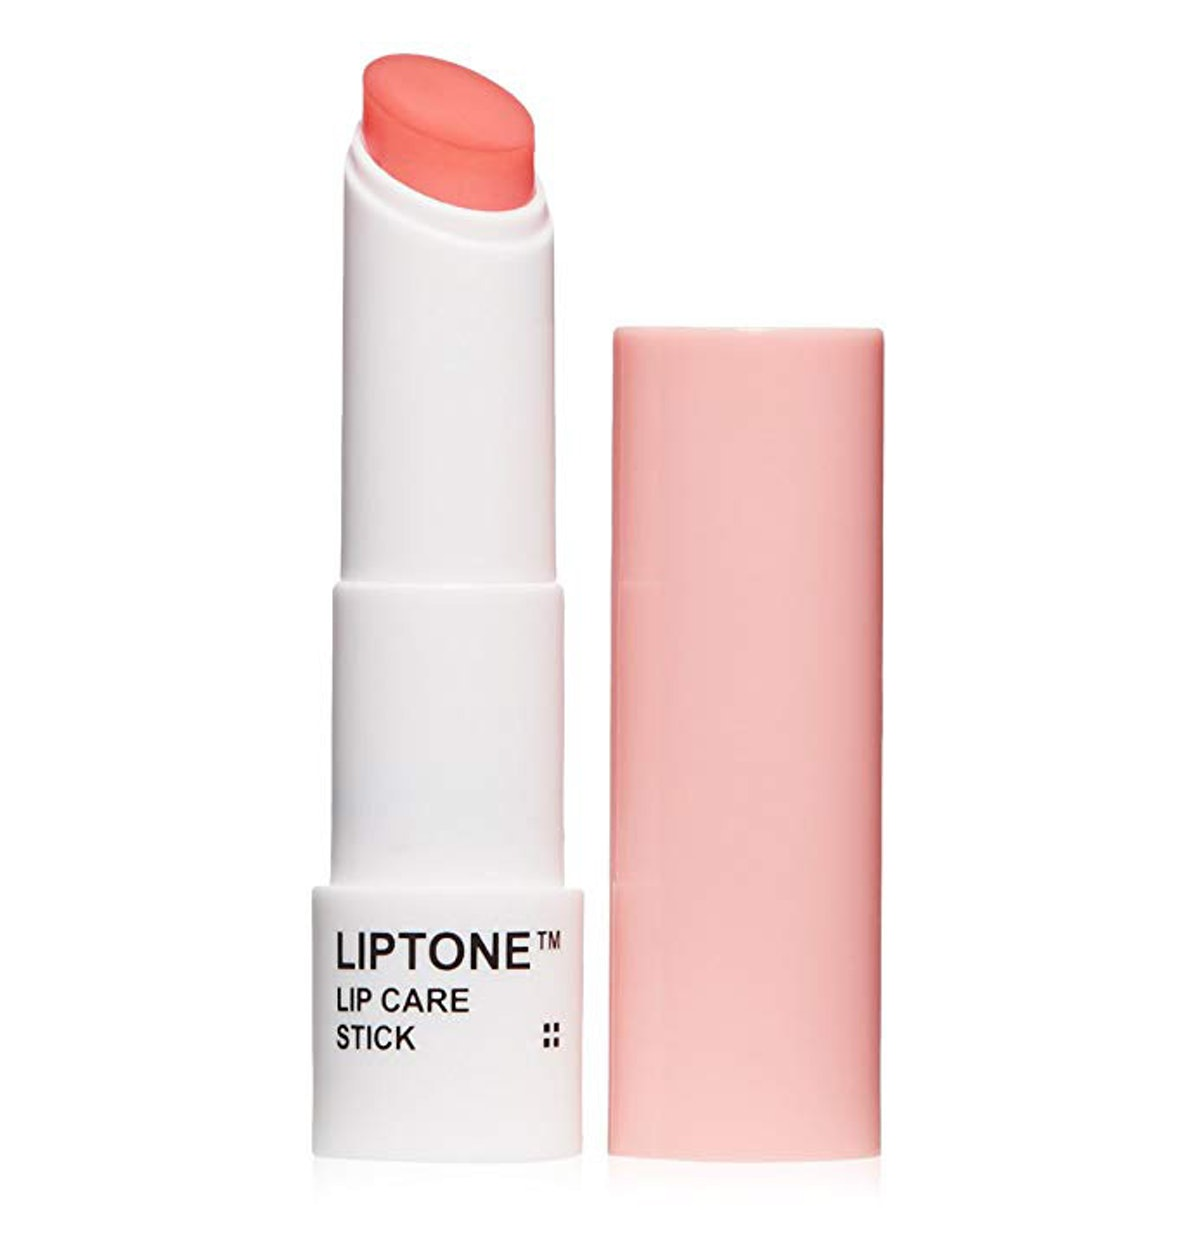 Tonymoly Liptone Lip Care Stick